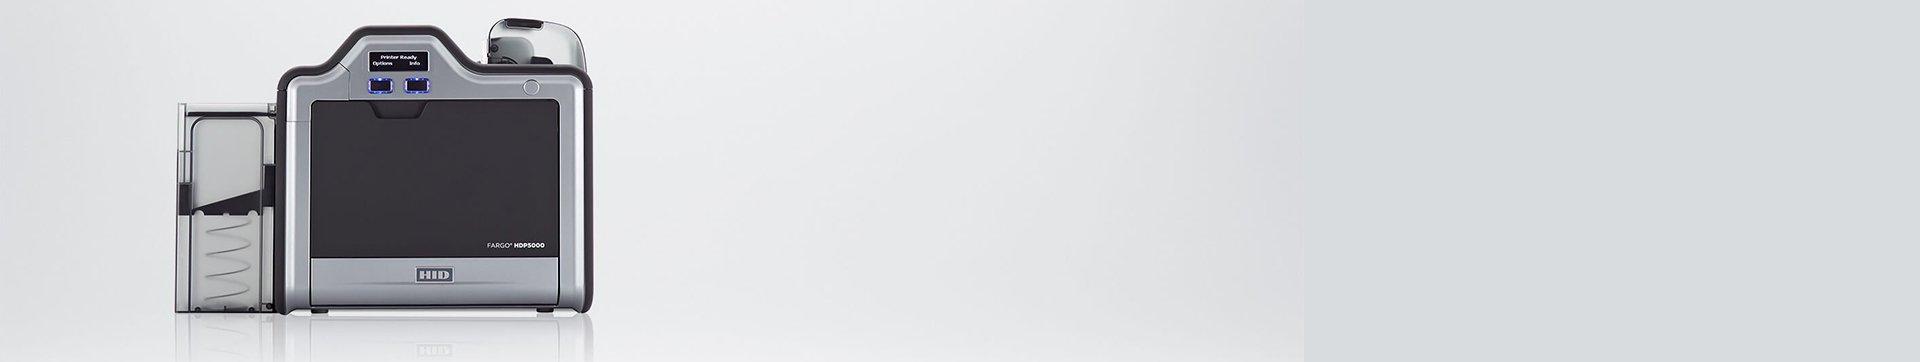 ID Stampaci - Fargo HDP5000